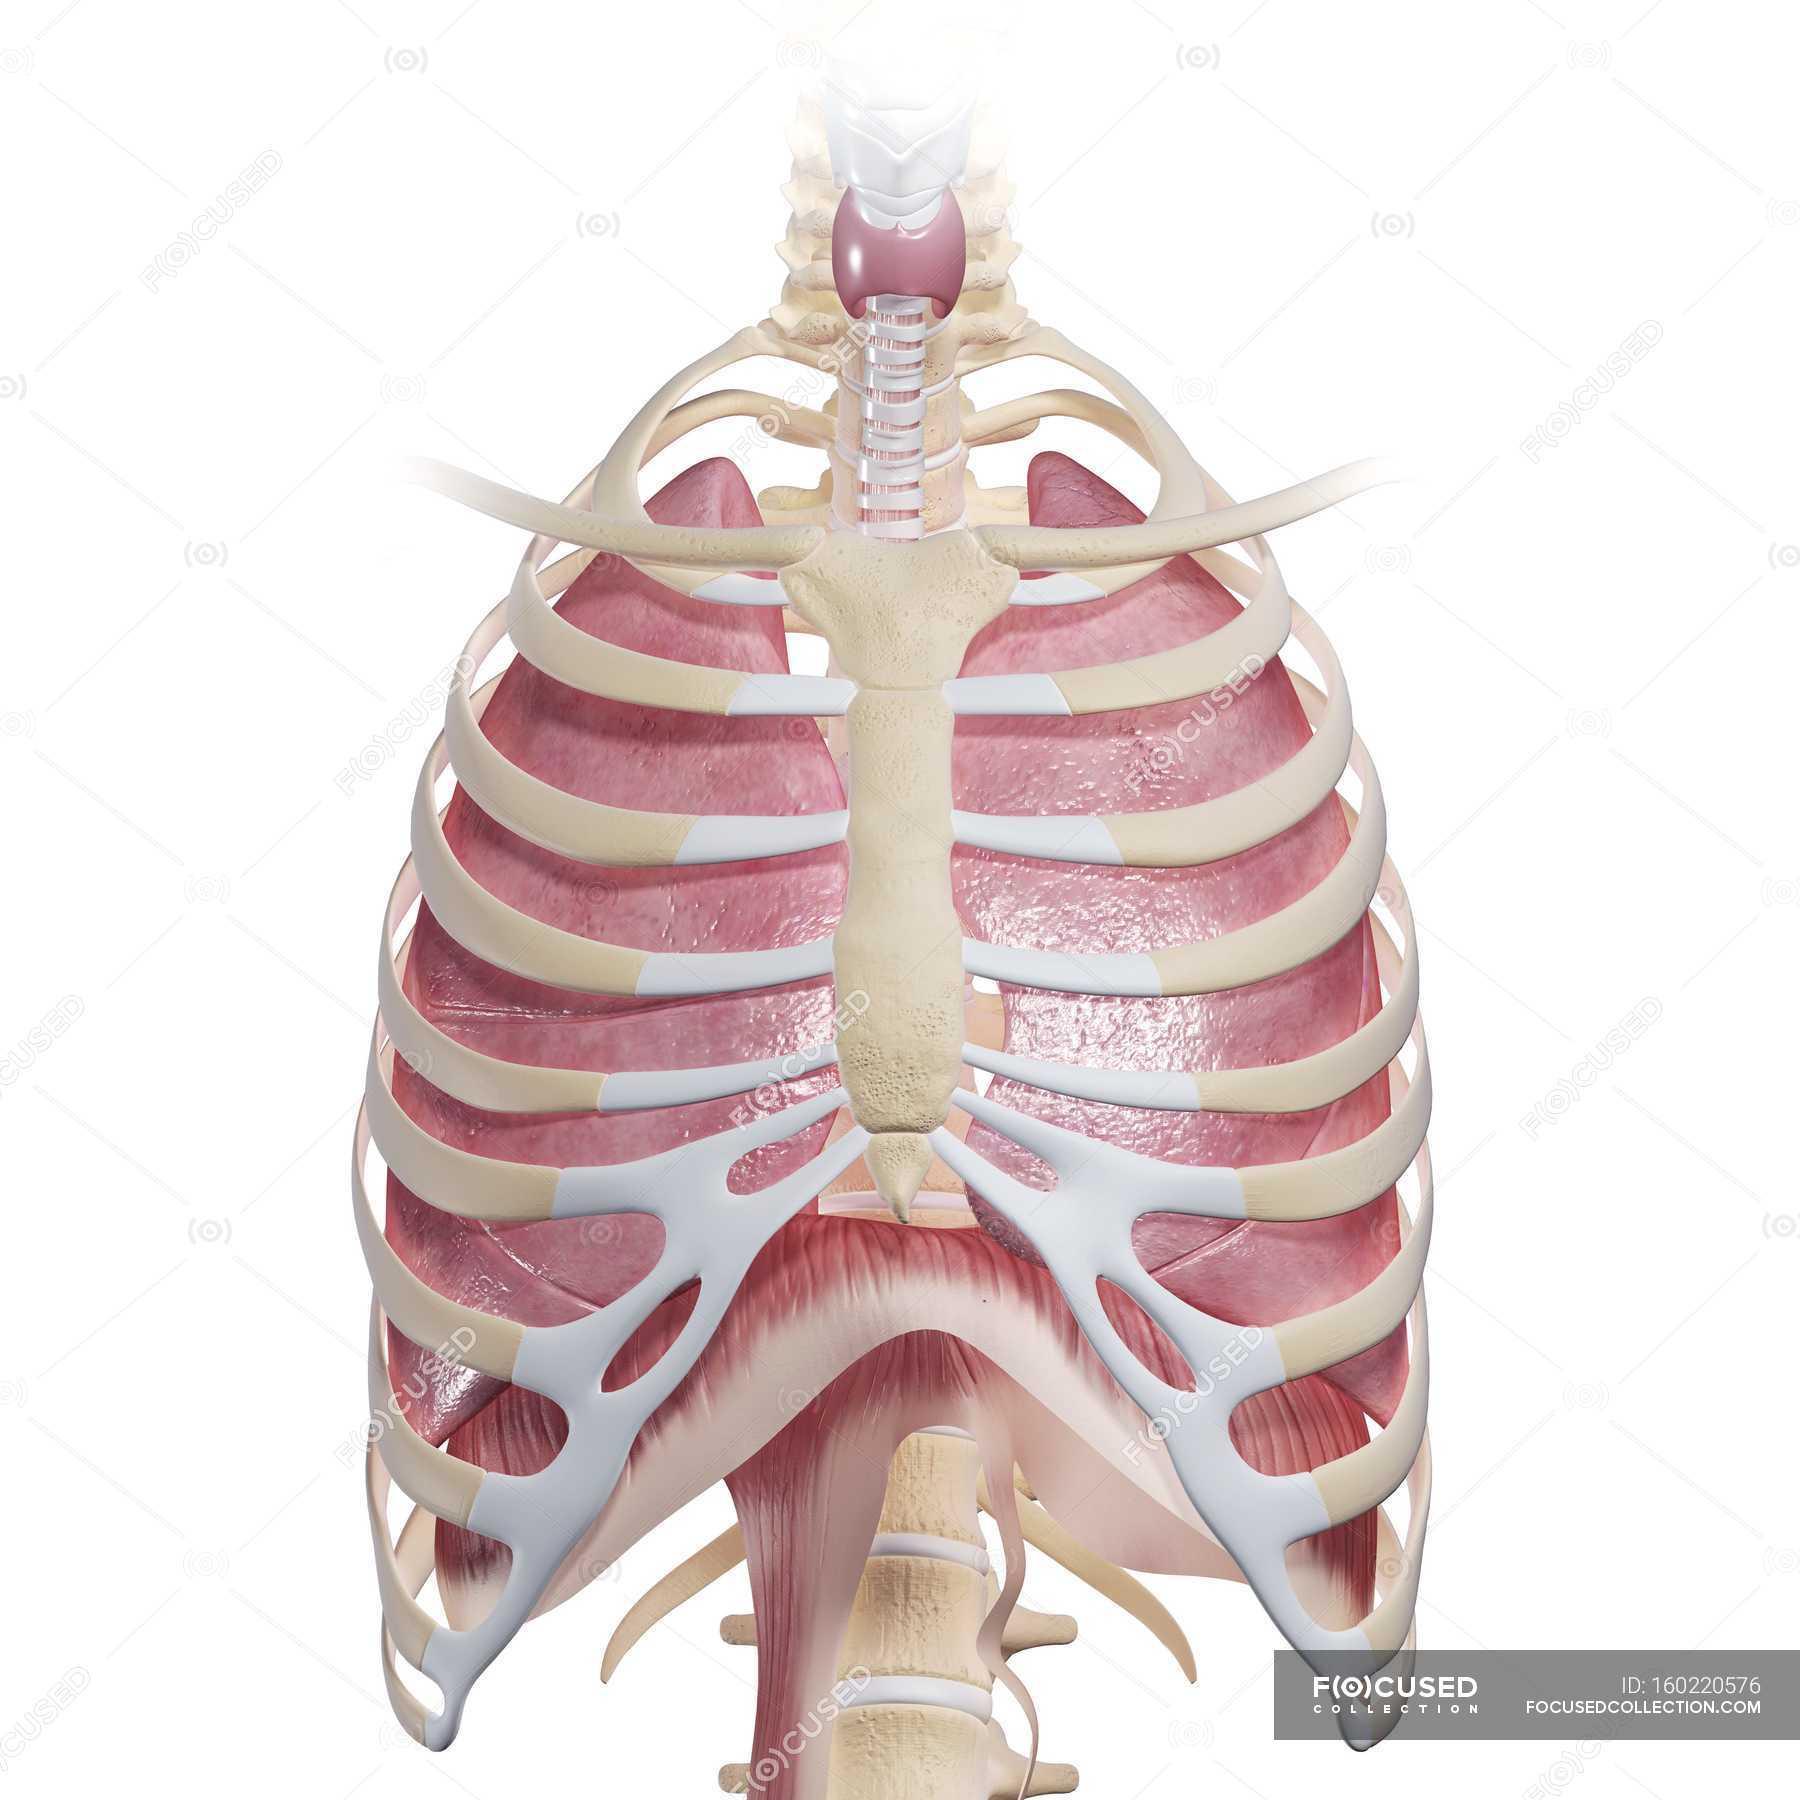 Human Chest Anatomy Close Up Respiratory System Stock Photo